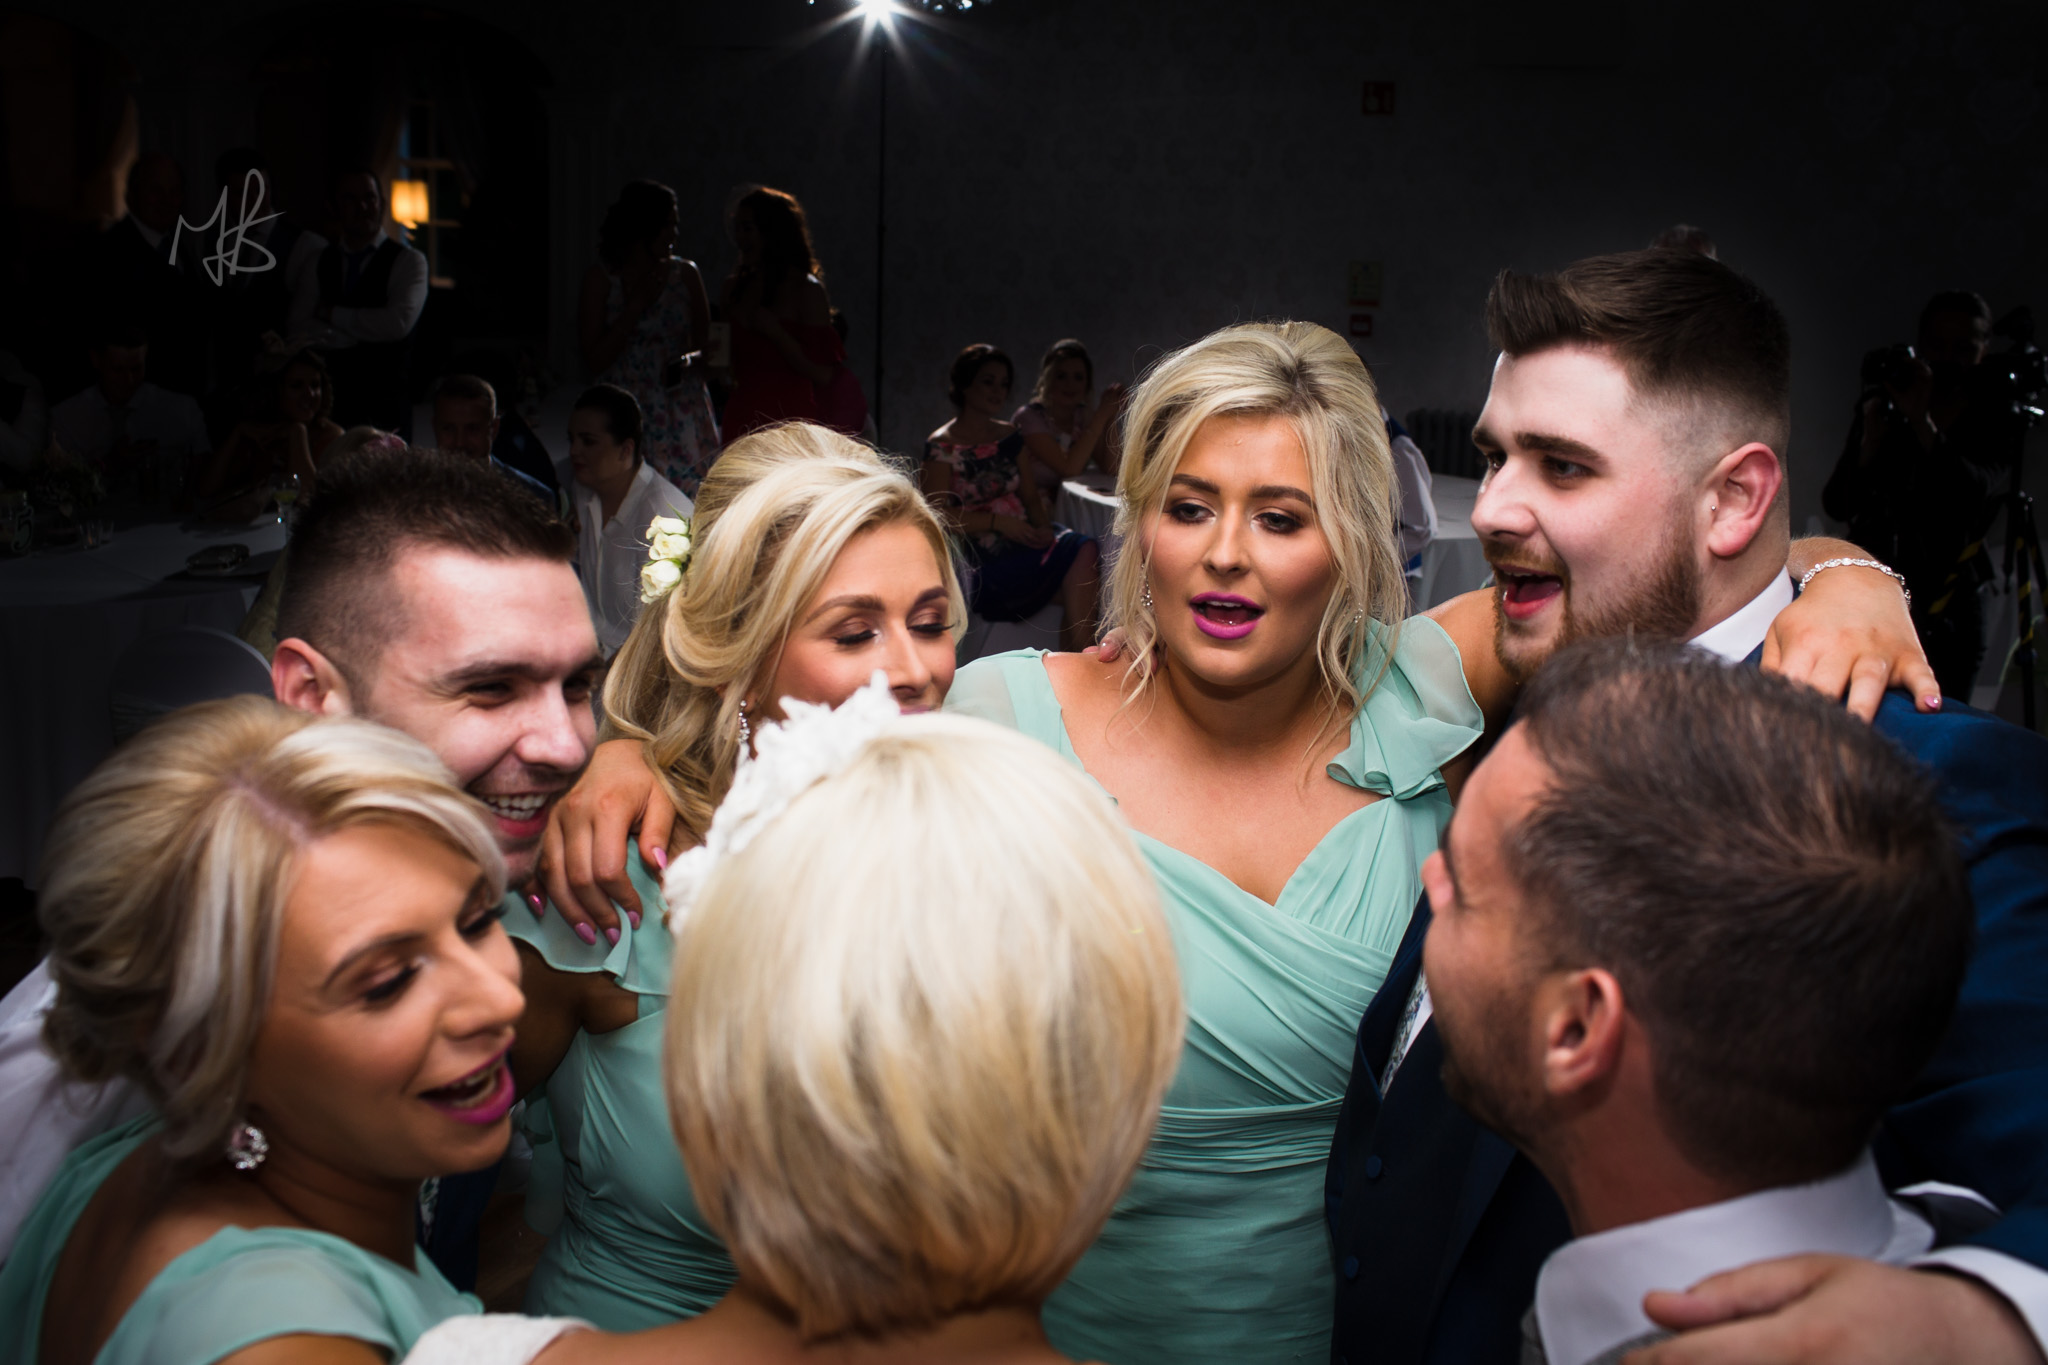 Northern-Ireland-Wedding-Photographer-Mark-Barnes-Ballymena_wedding-photography-Leighinmohr-House-Seamas_Alanna_For-web-58.jpg